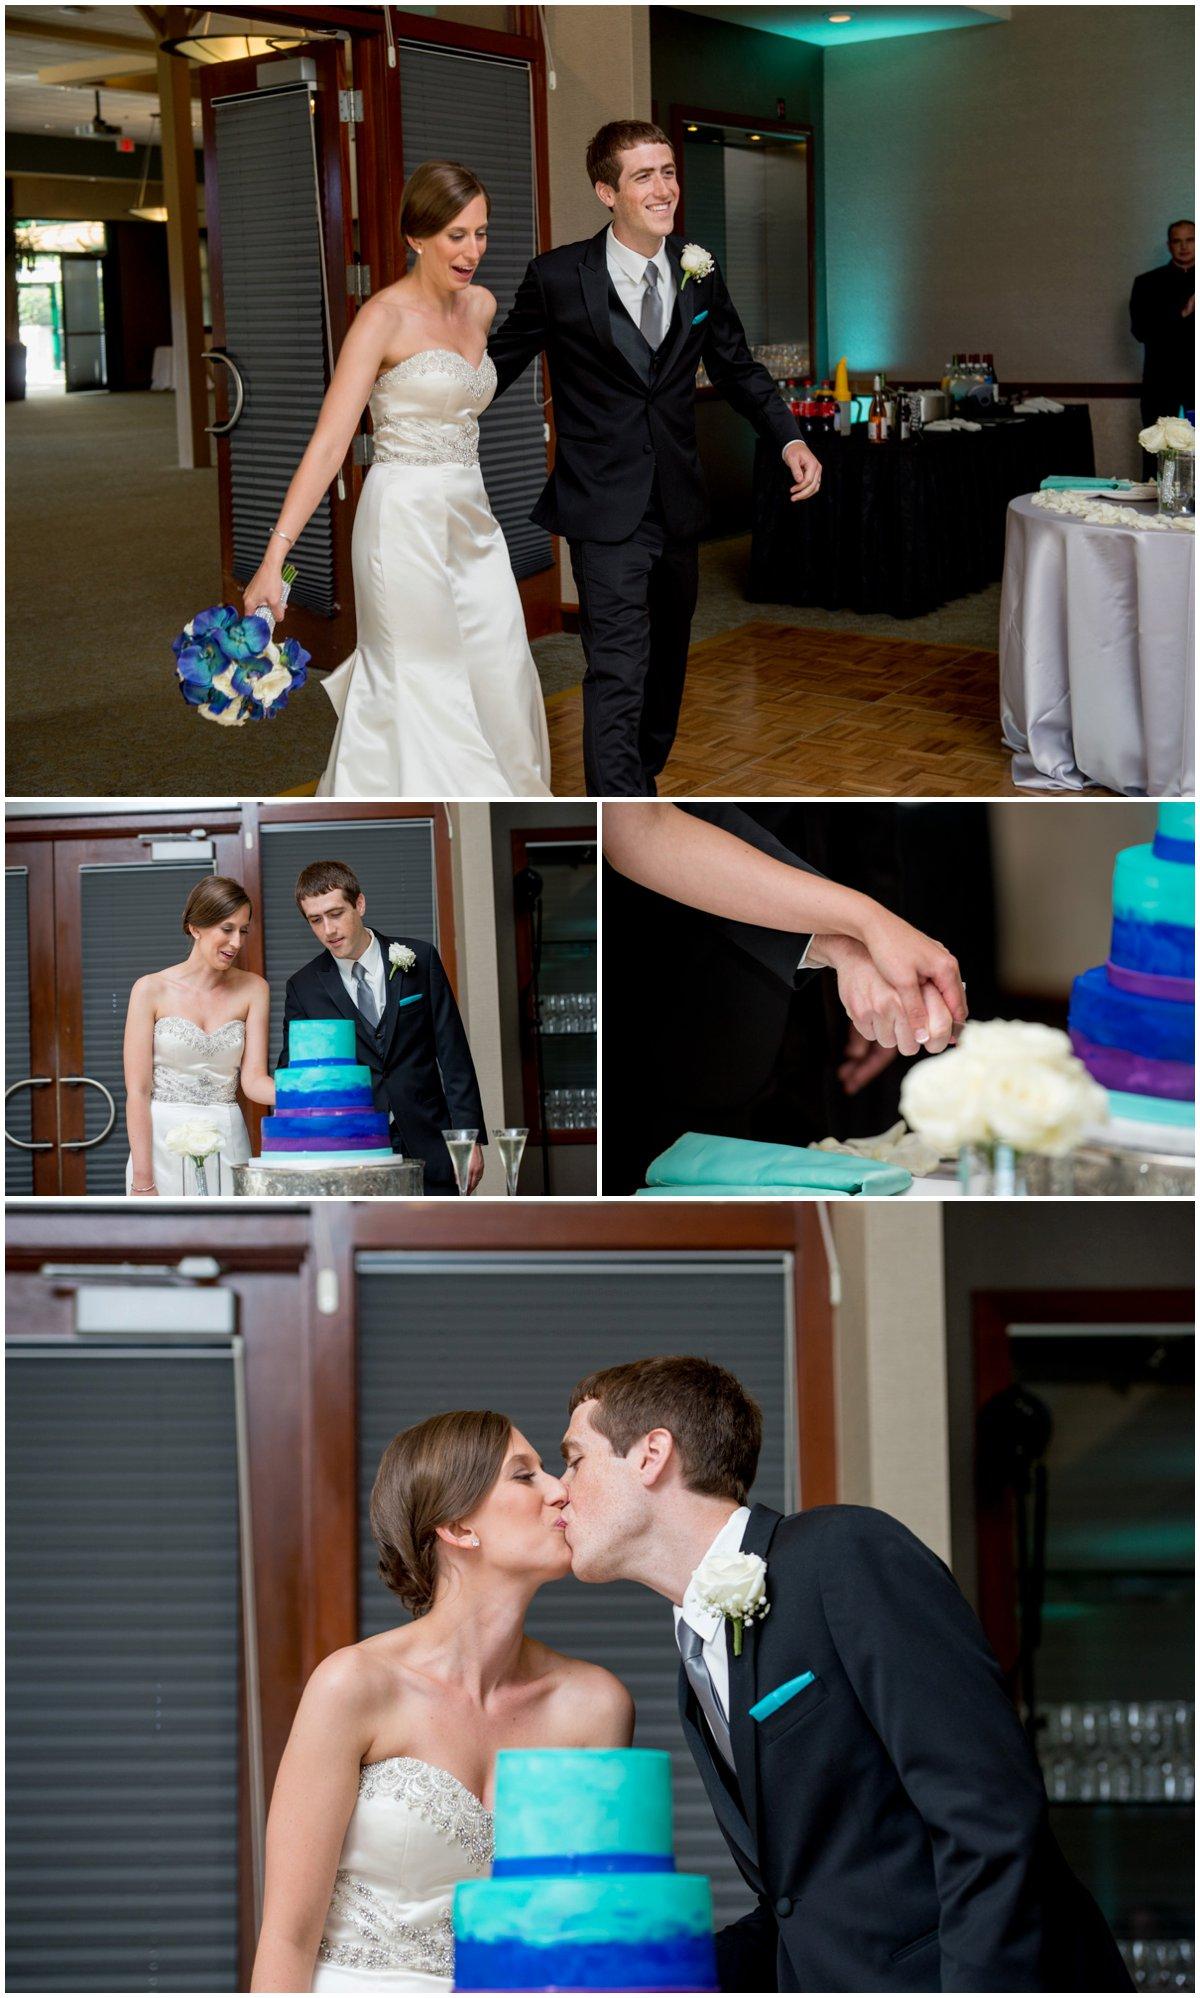 Mavris-wedding-pictures-Nate-Crouch-019.jpg